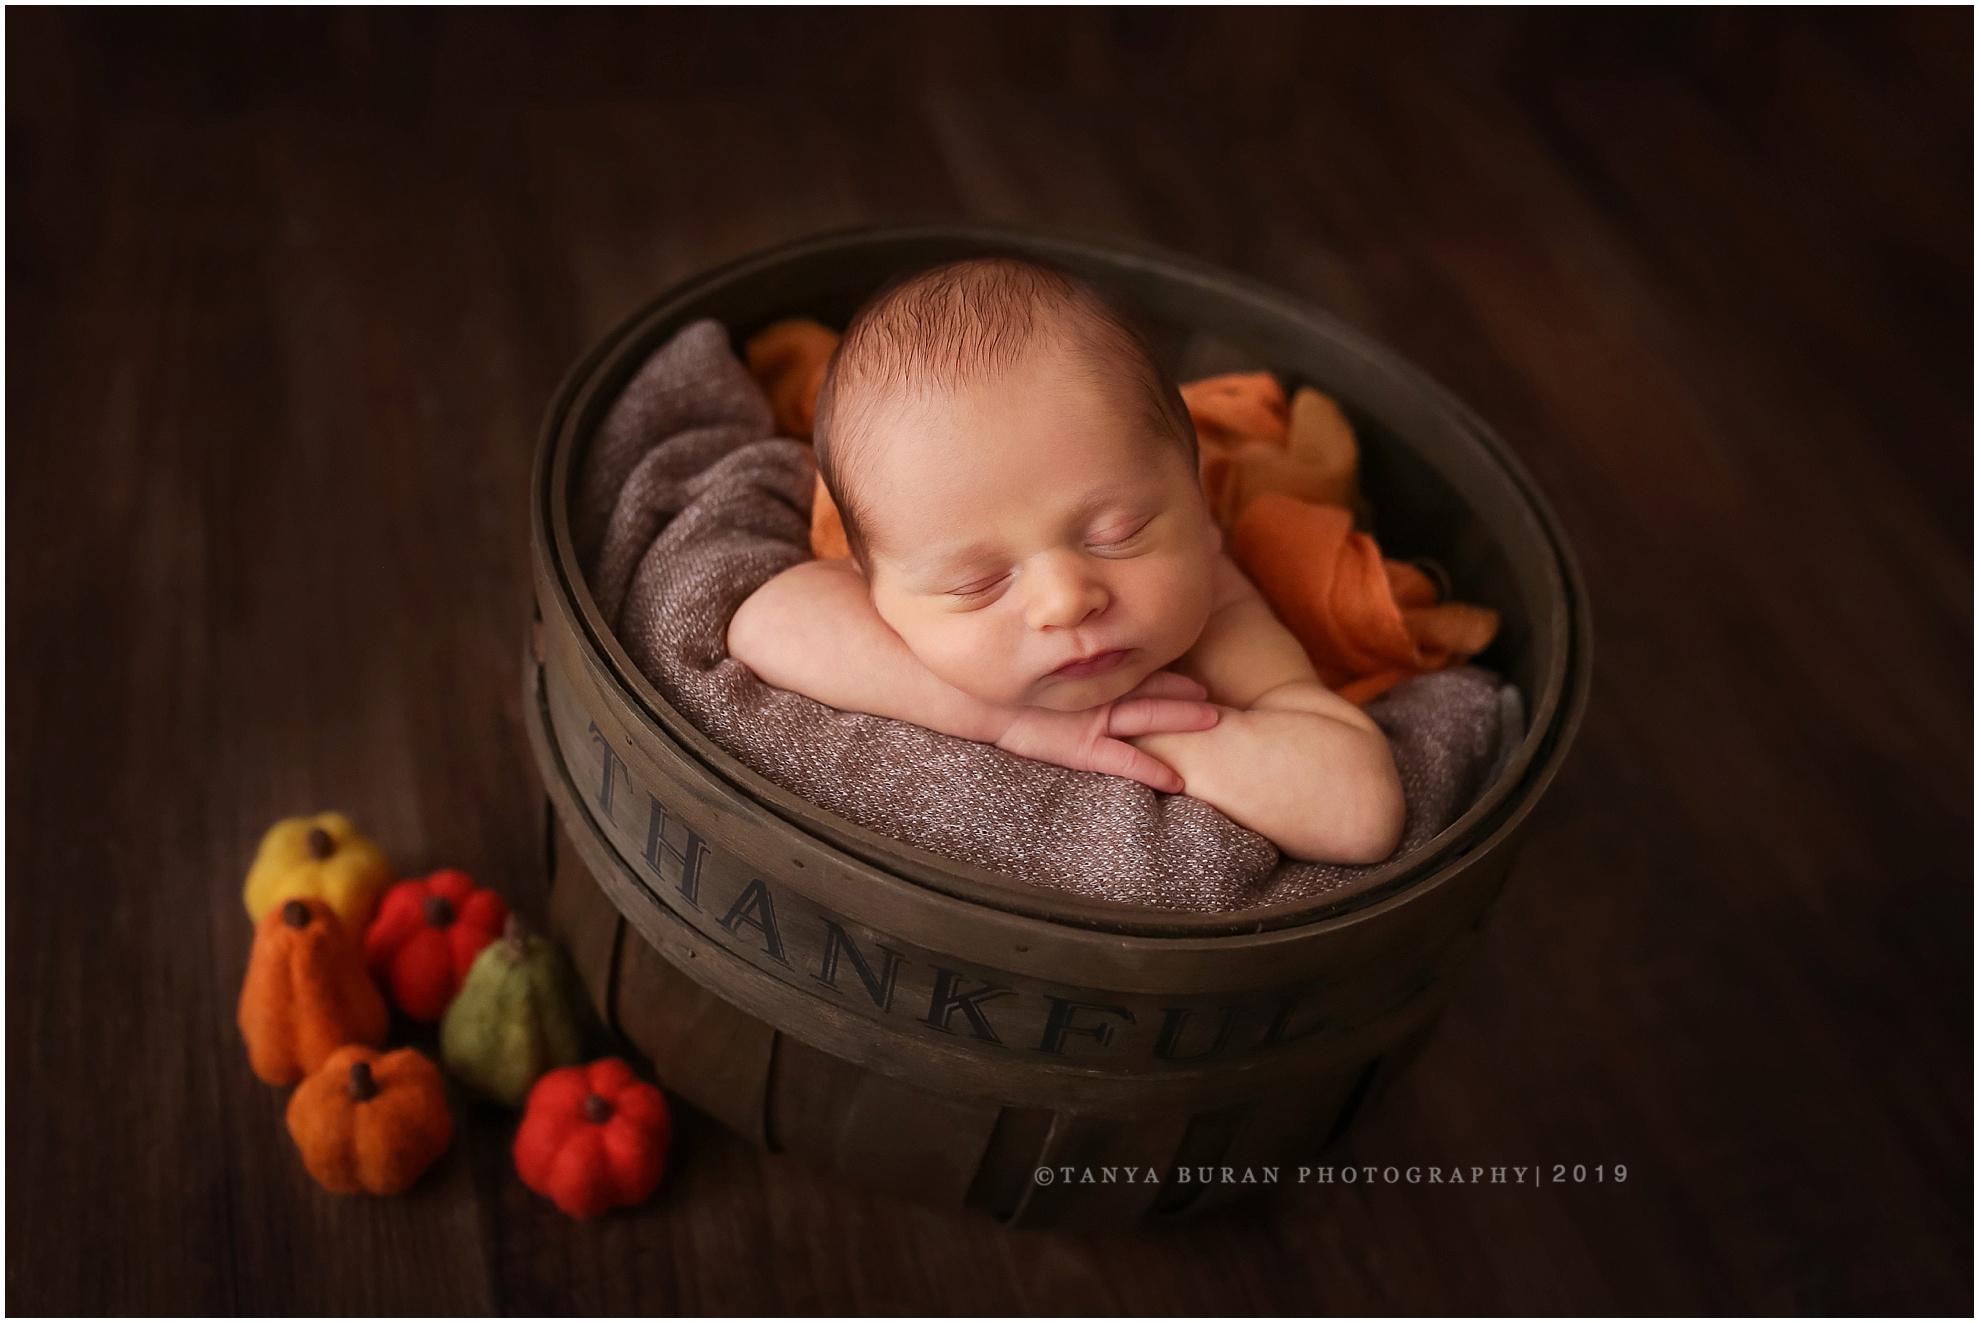 Jersey city newborn photographer tanya buran photography